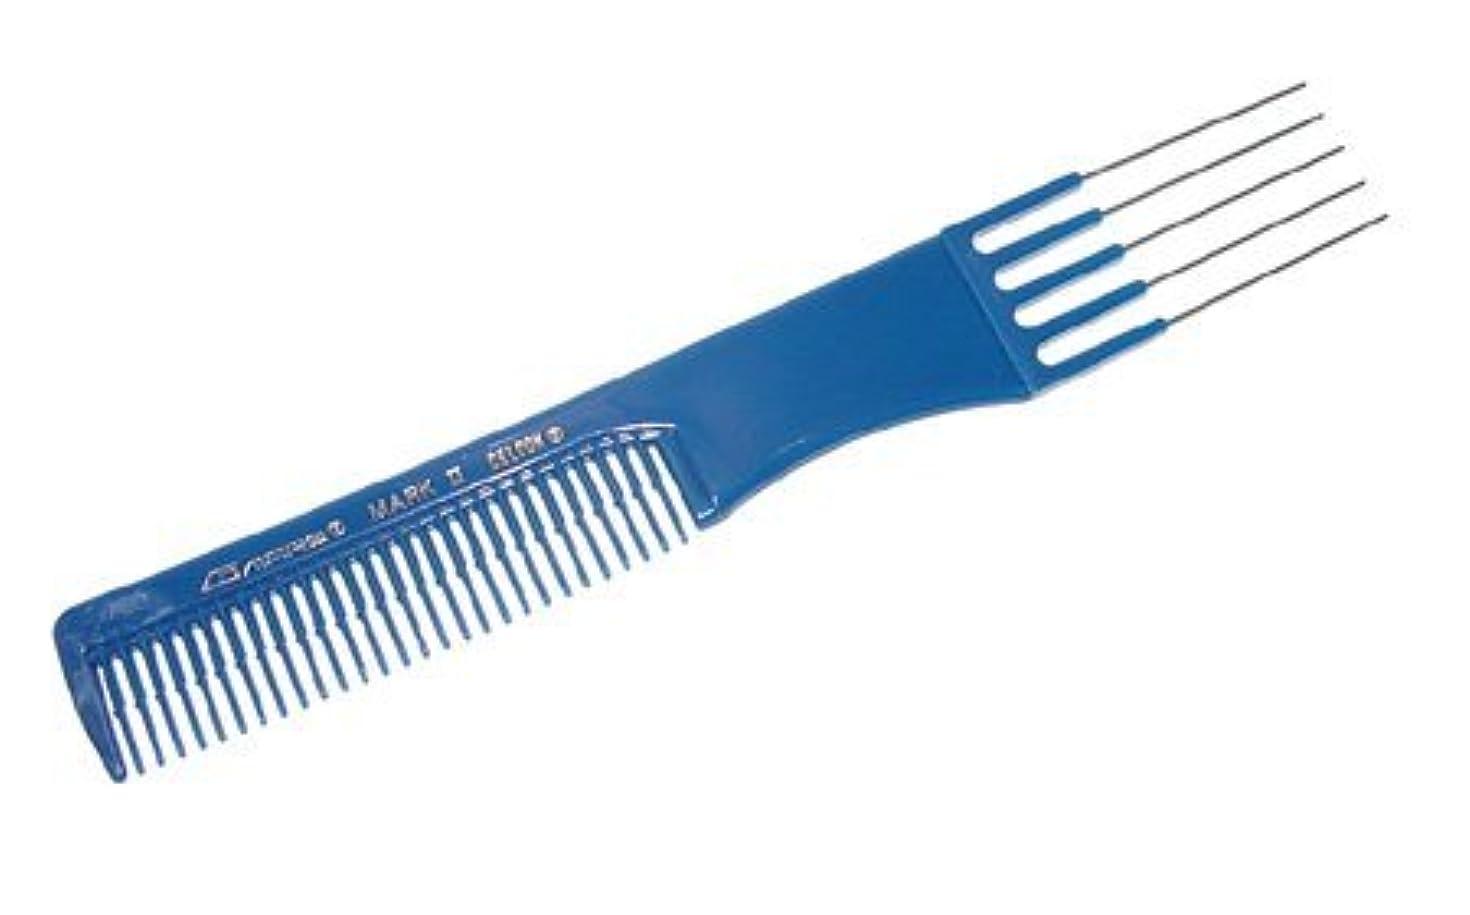 歴史的津波裸Comare Mark II Stainless Steel Lift Comb [並行輸入品]